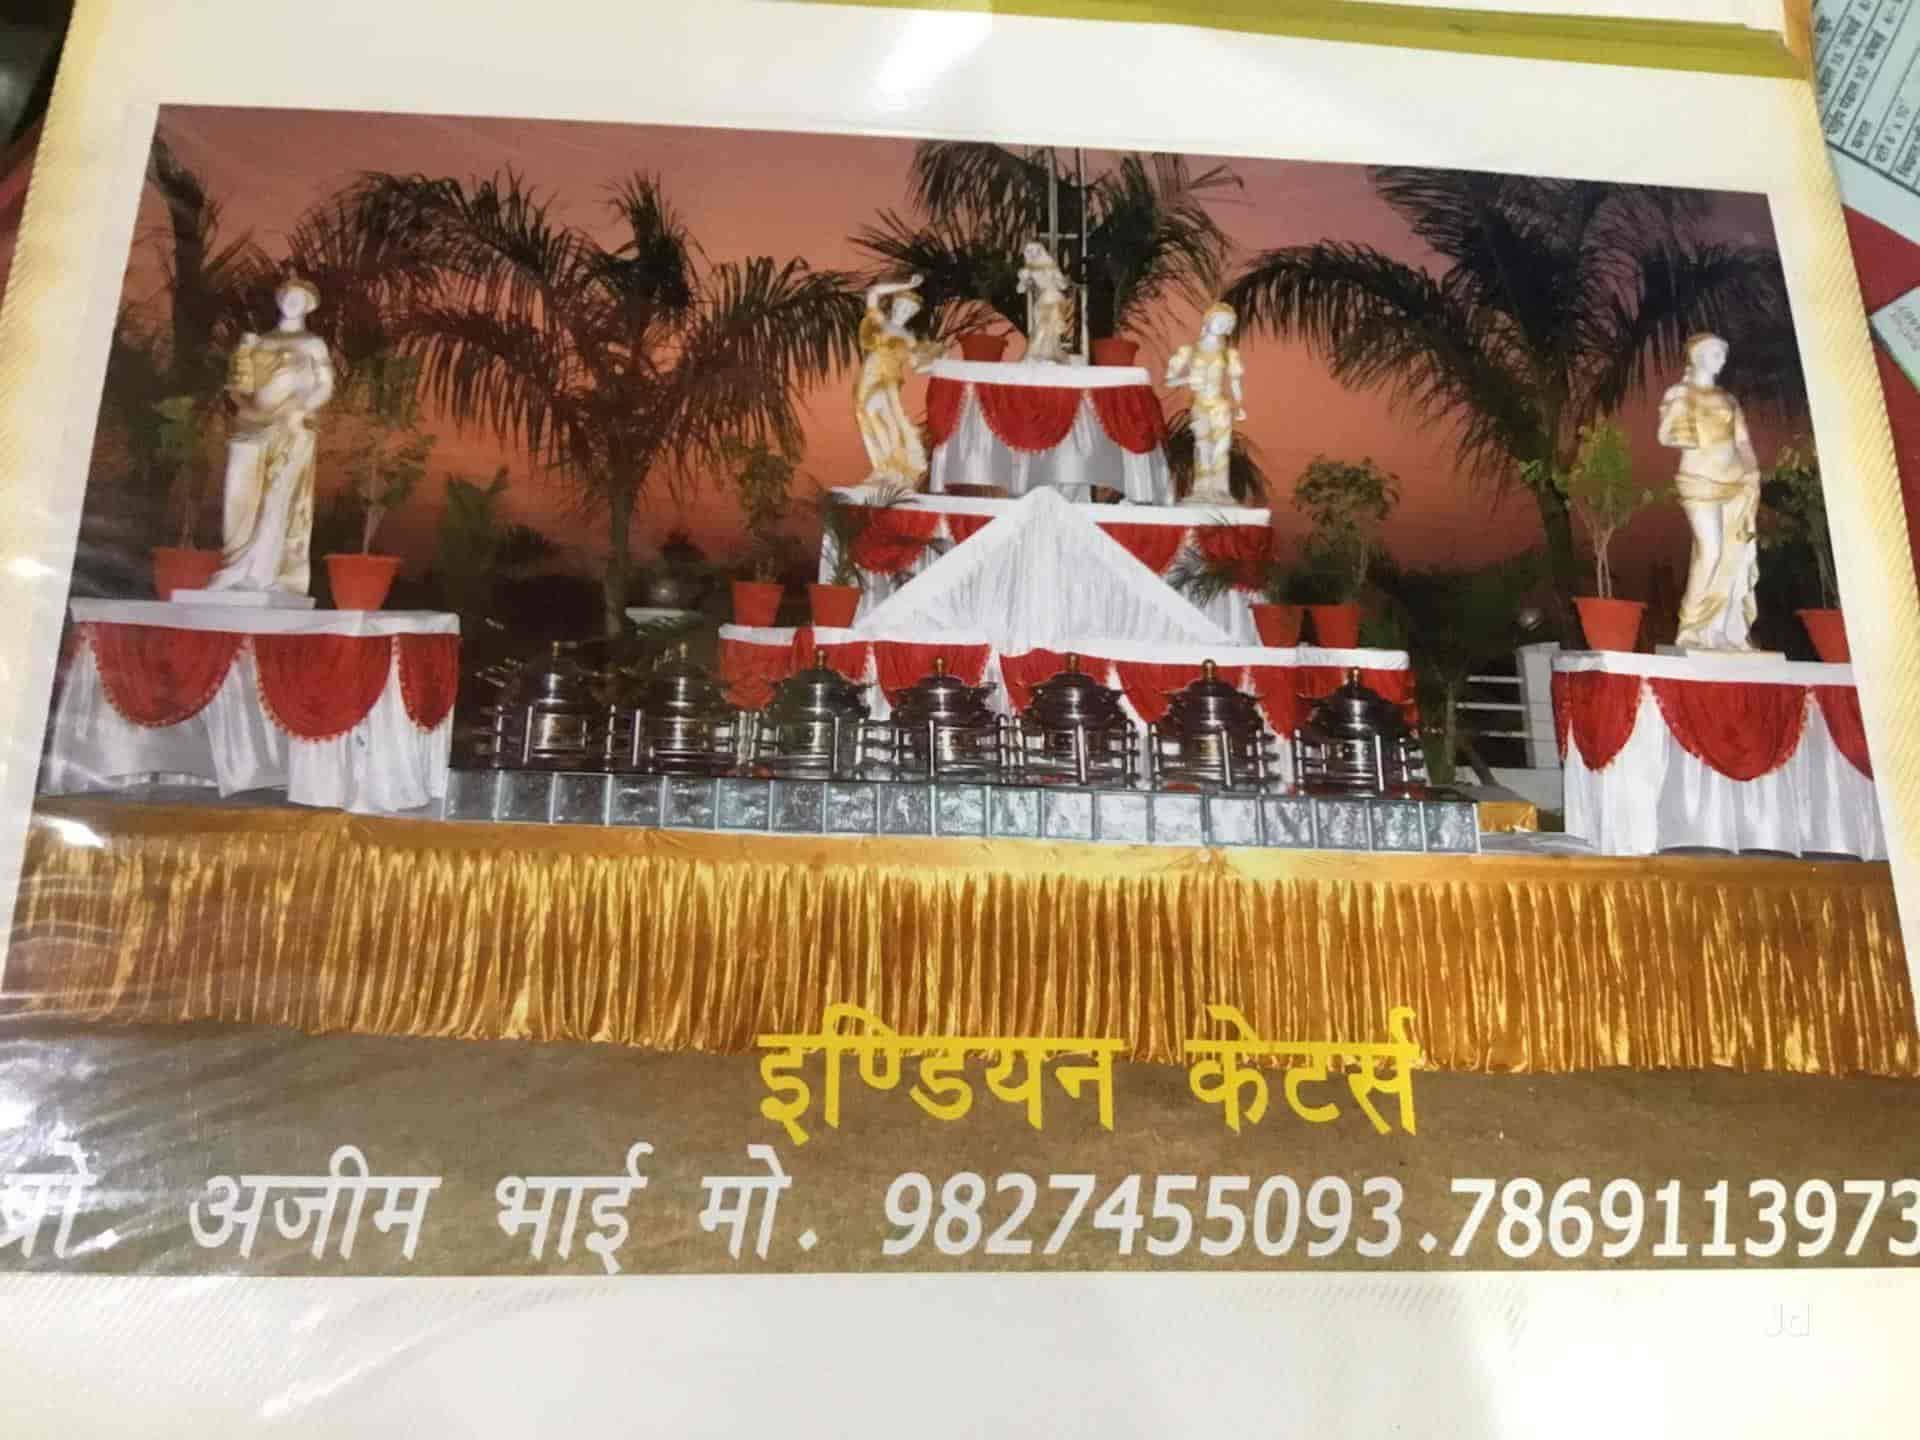 Indian Catring Service AND EVENT Organisation, Ashoka Garden